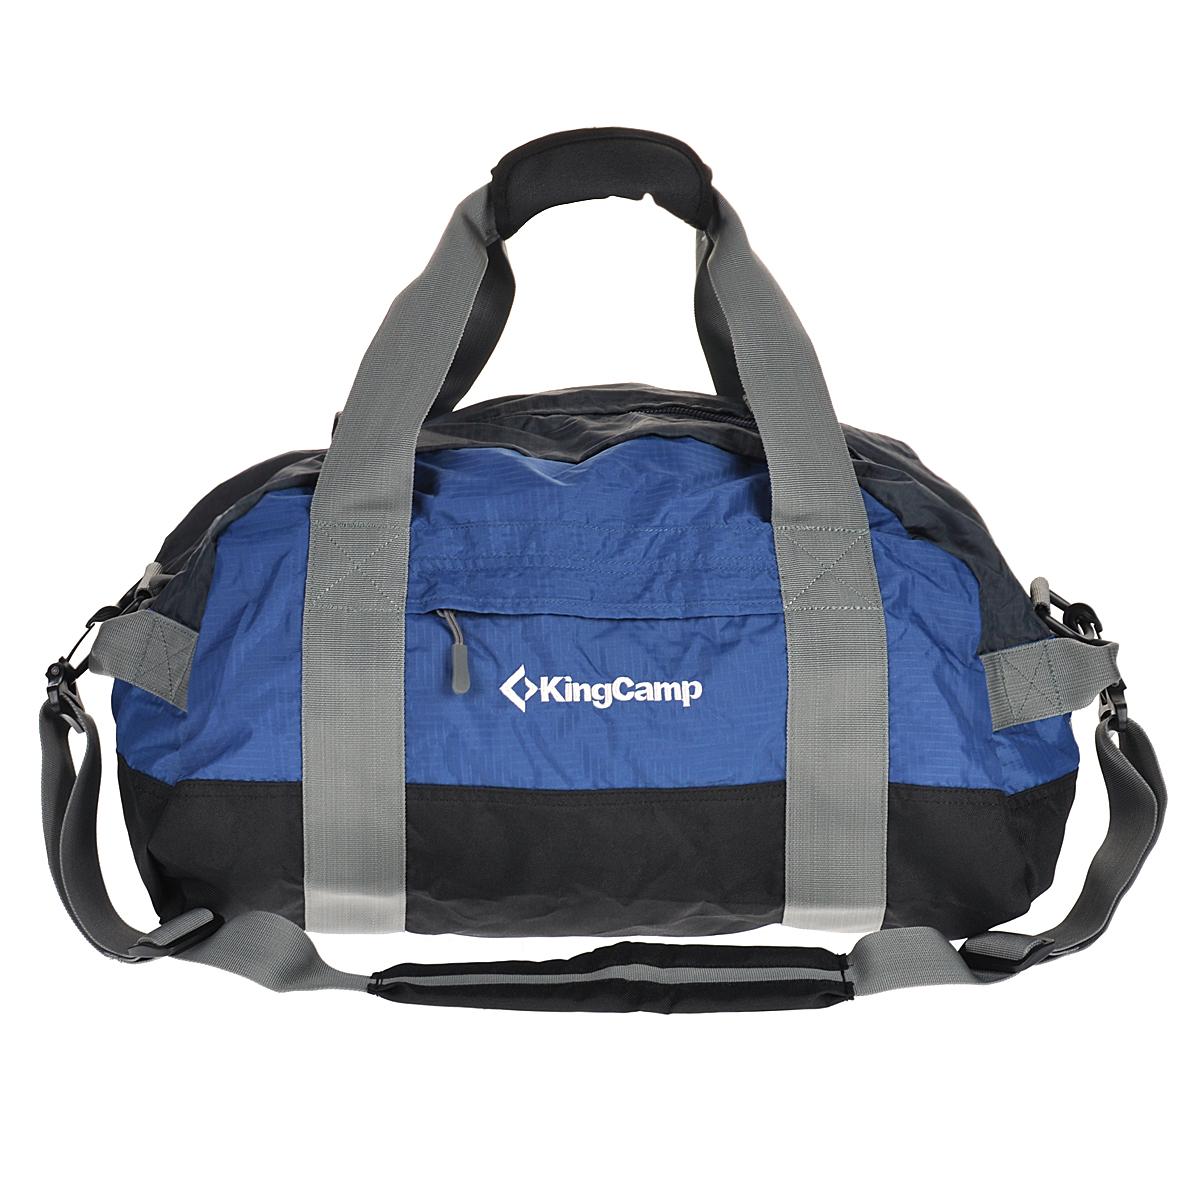 Сумка-баул King Camp  Airporter , 60 л - Туристические сумки